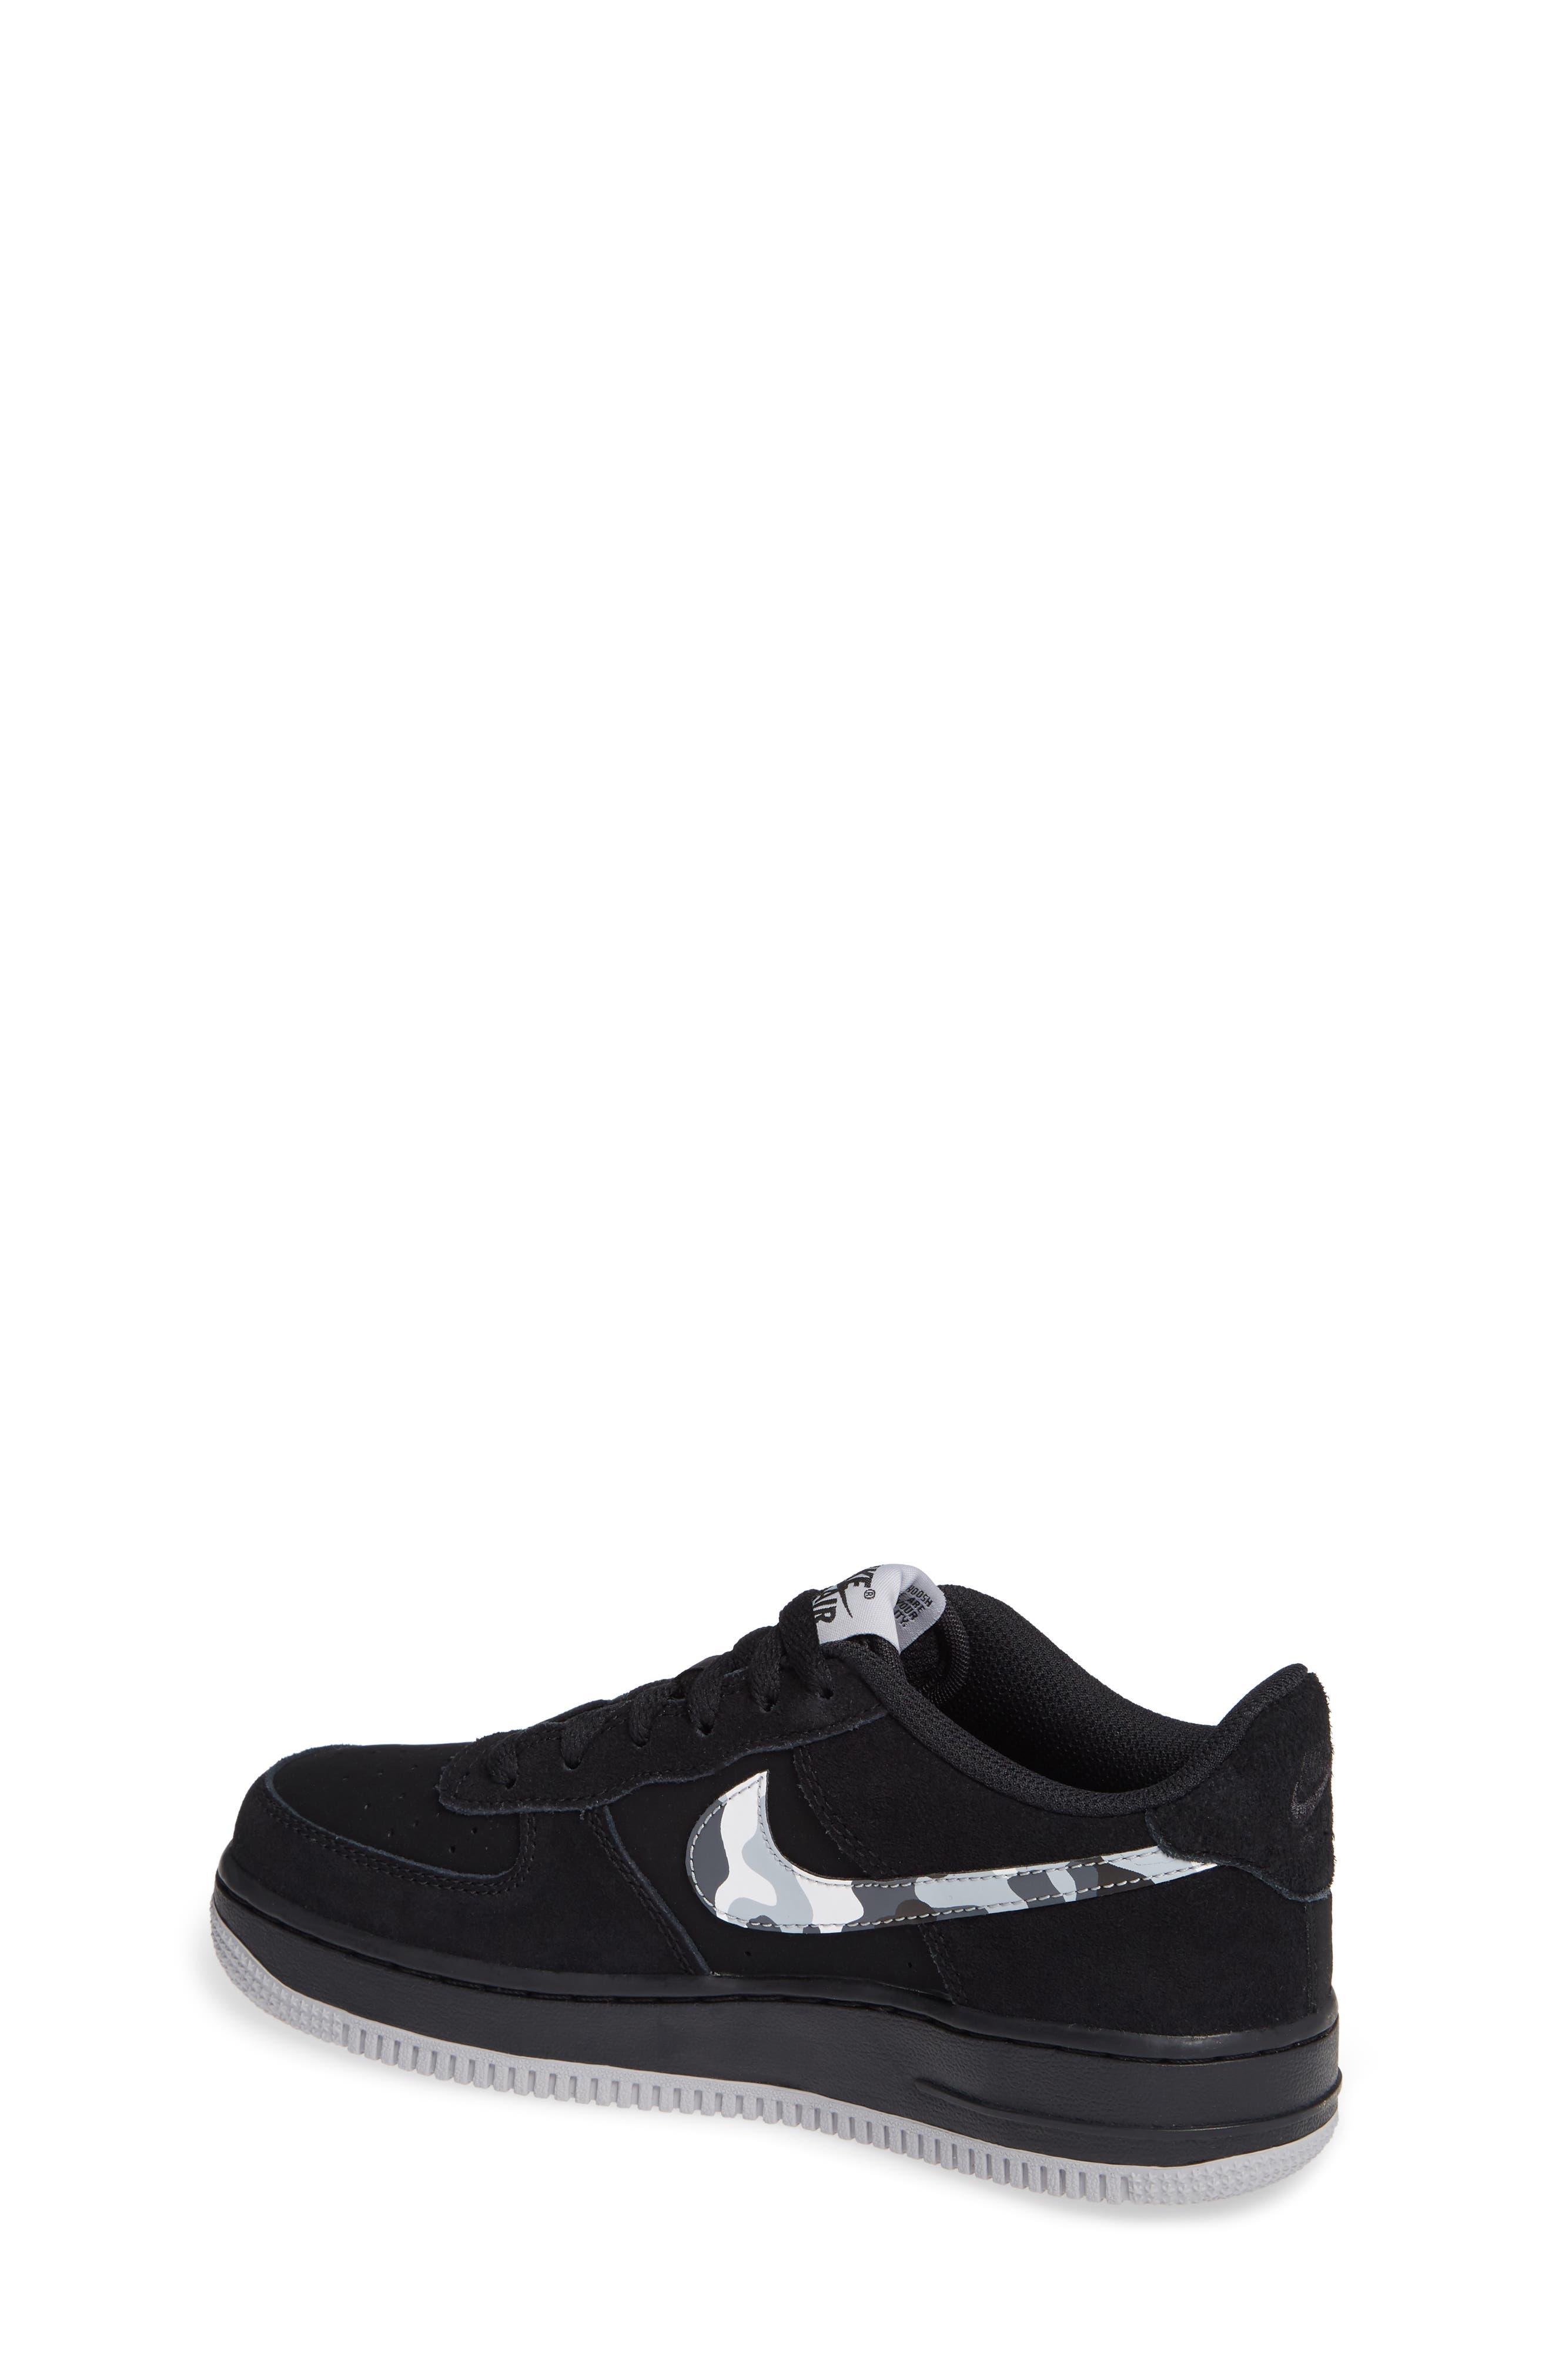 Air Force 1 Sneaker,                             Alternate thumbnail 2, color,                             BLACK/ GREY/ WHITE